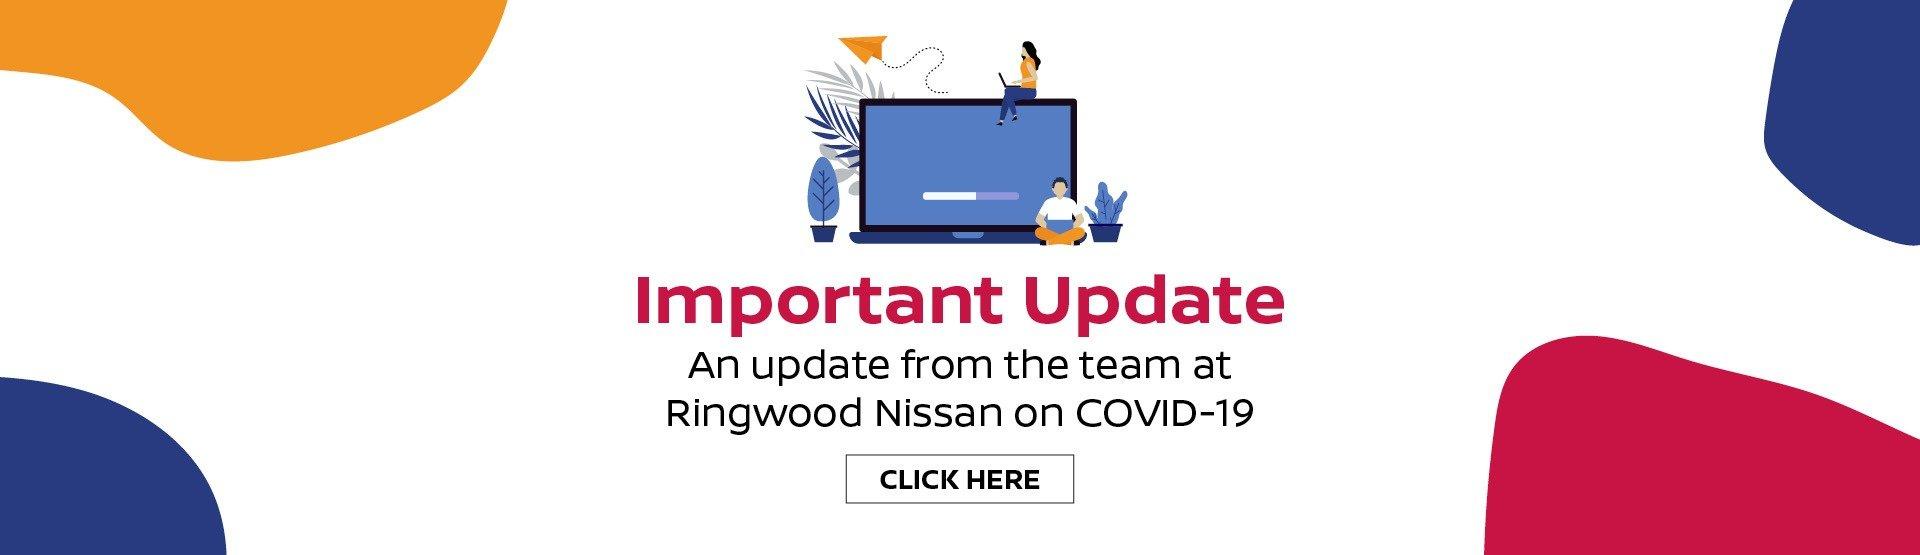 Ringwood Nissan COVID-19 Update